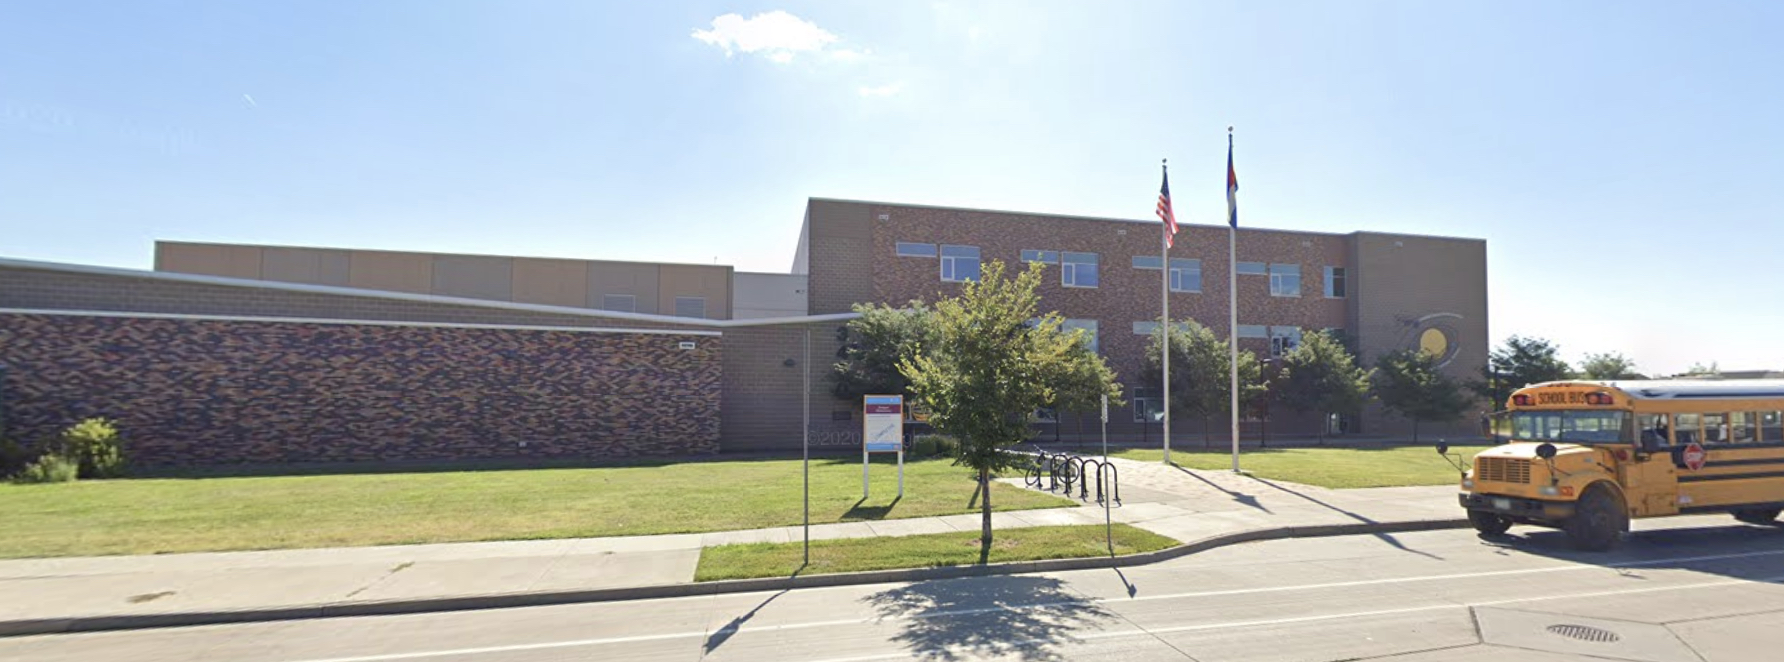 Swigert International School Denver Homes For Sale